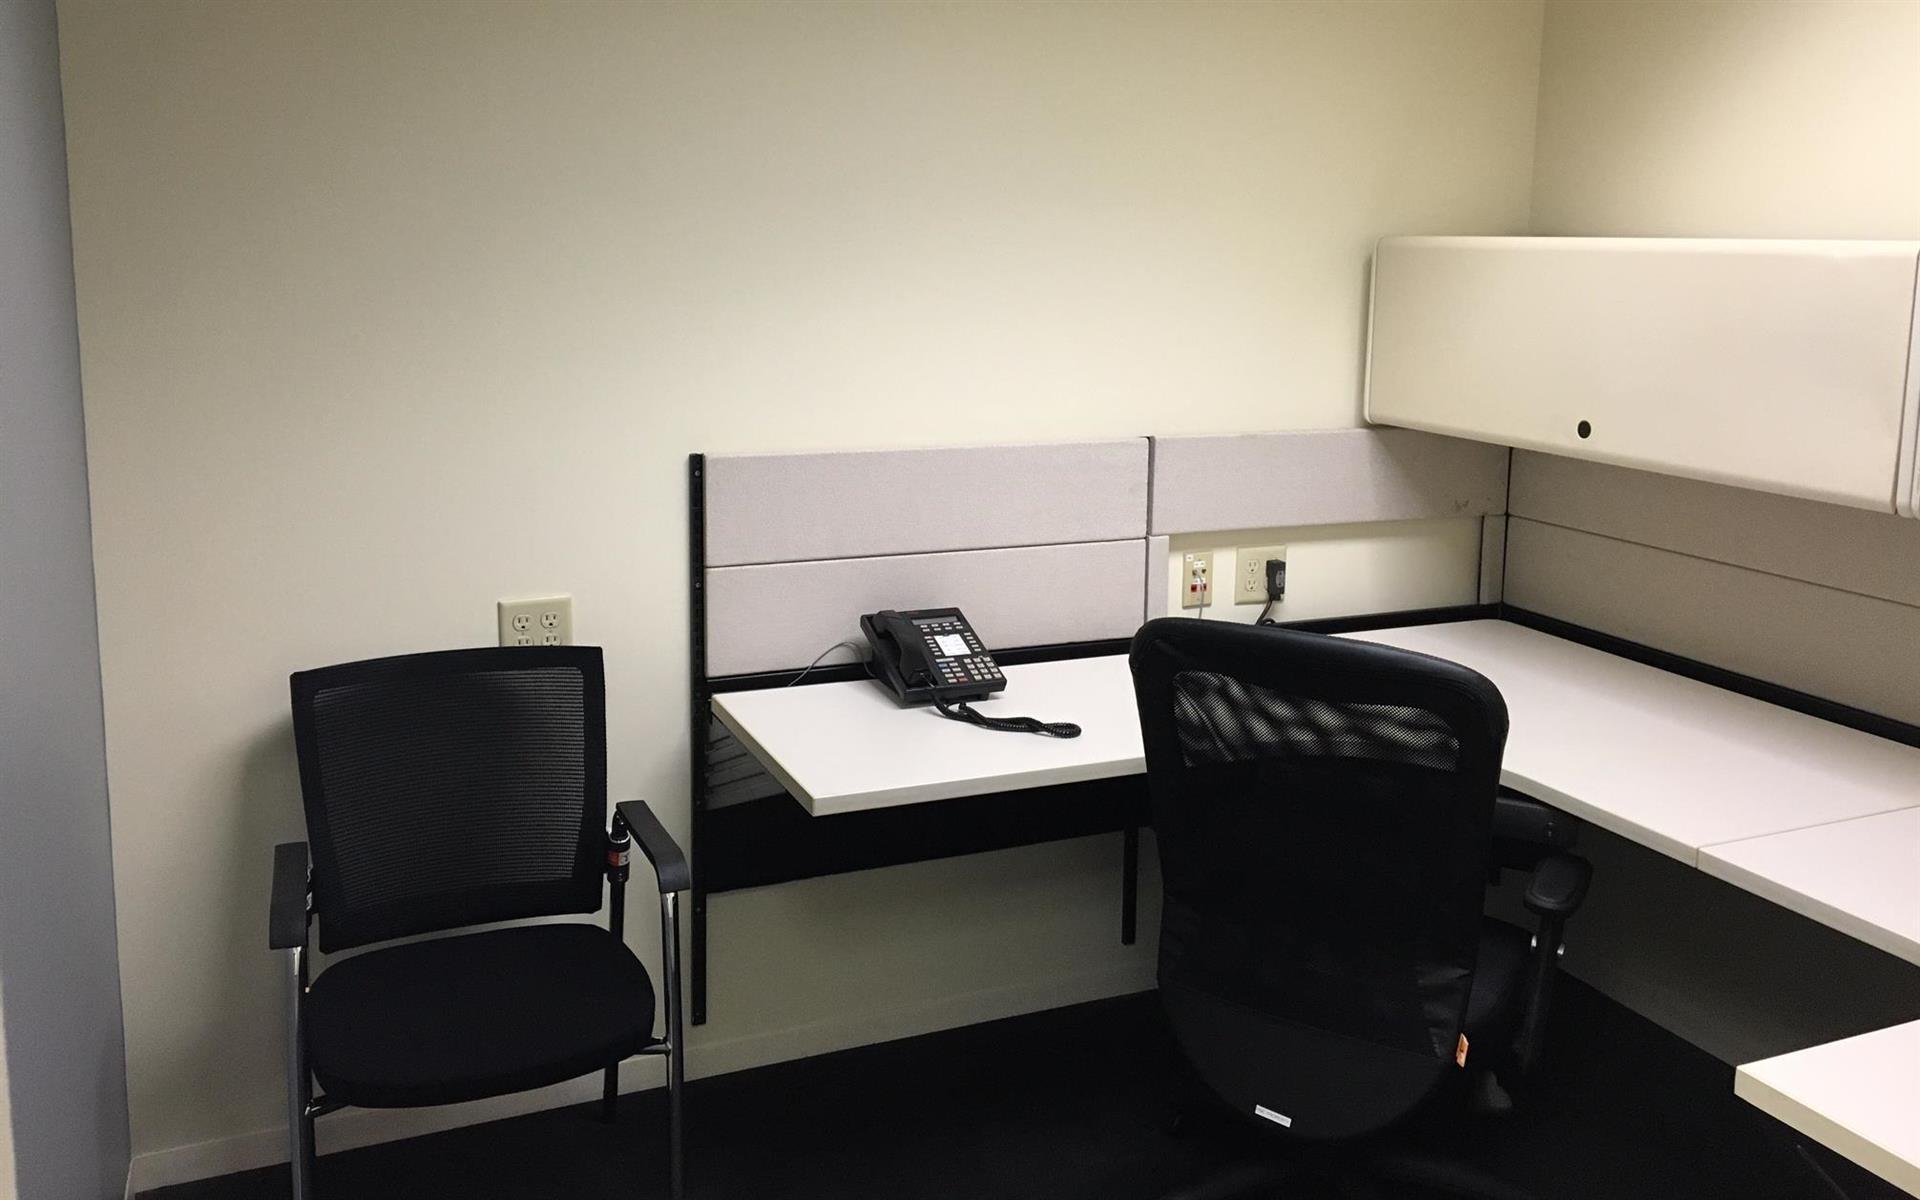 (BUR) Burbank Media District - Interior Office